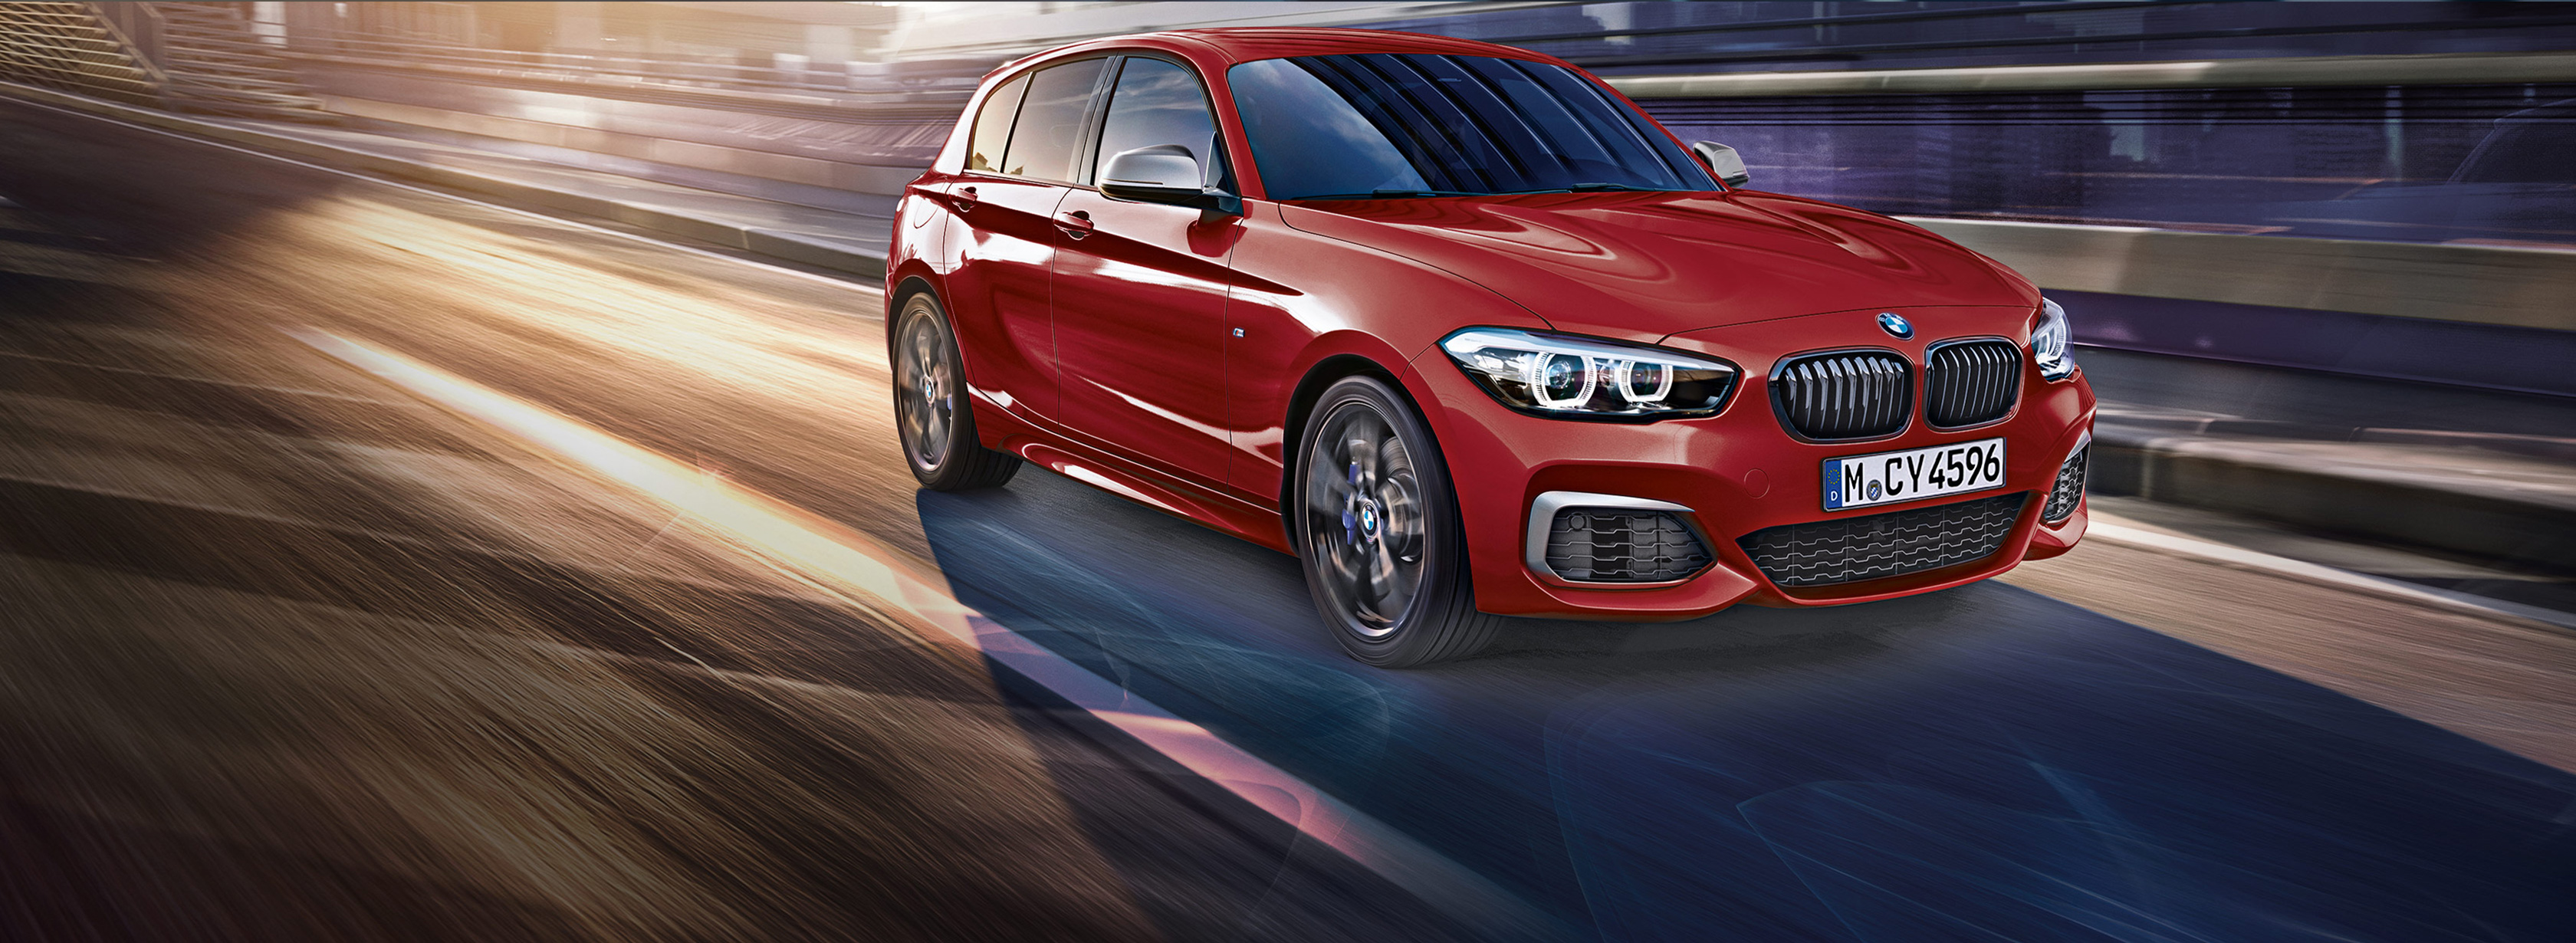 BMW Seria 1 editie limitata